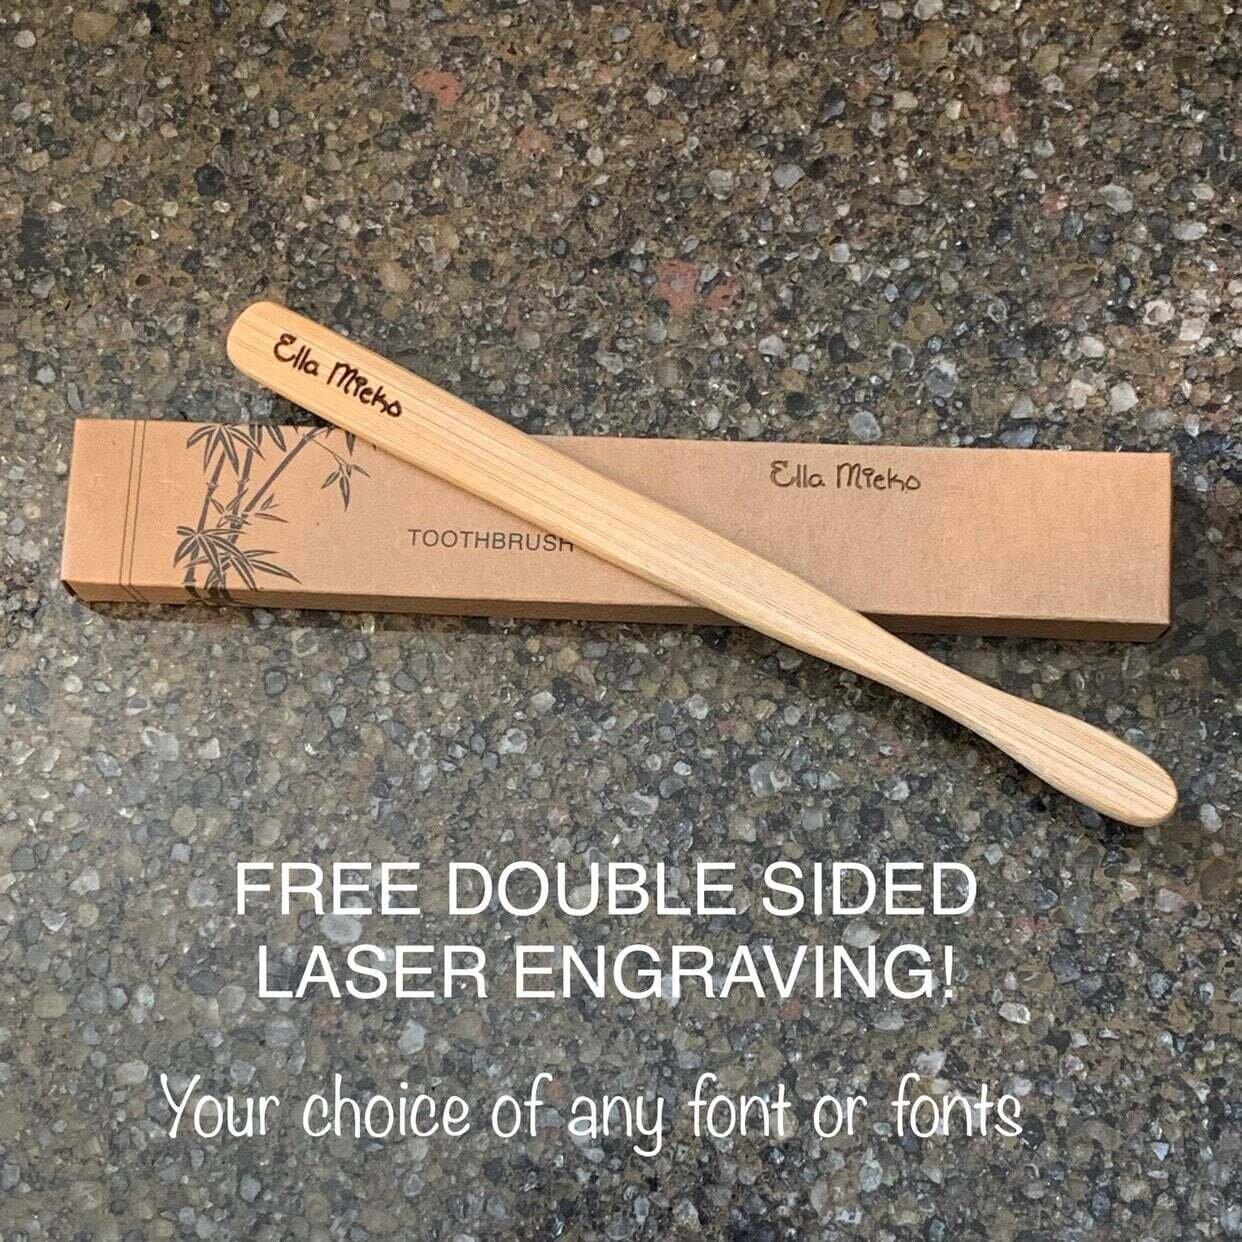 Custom laser engraved toothbrush sets